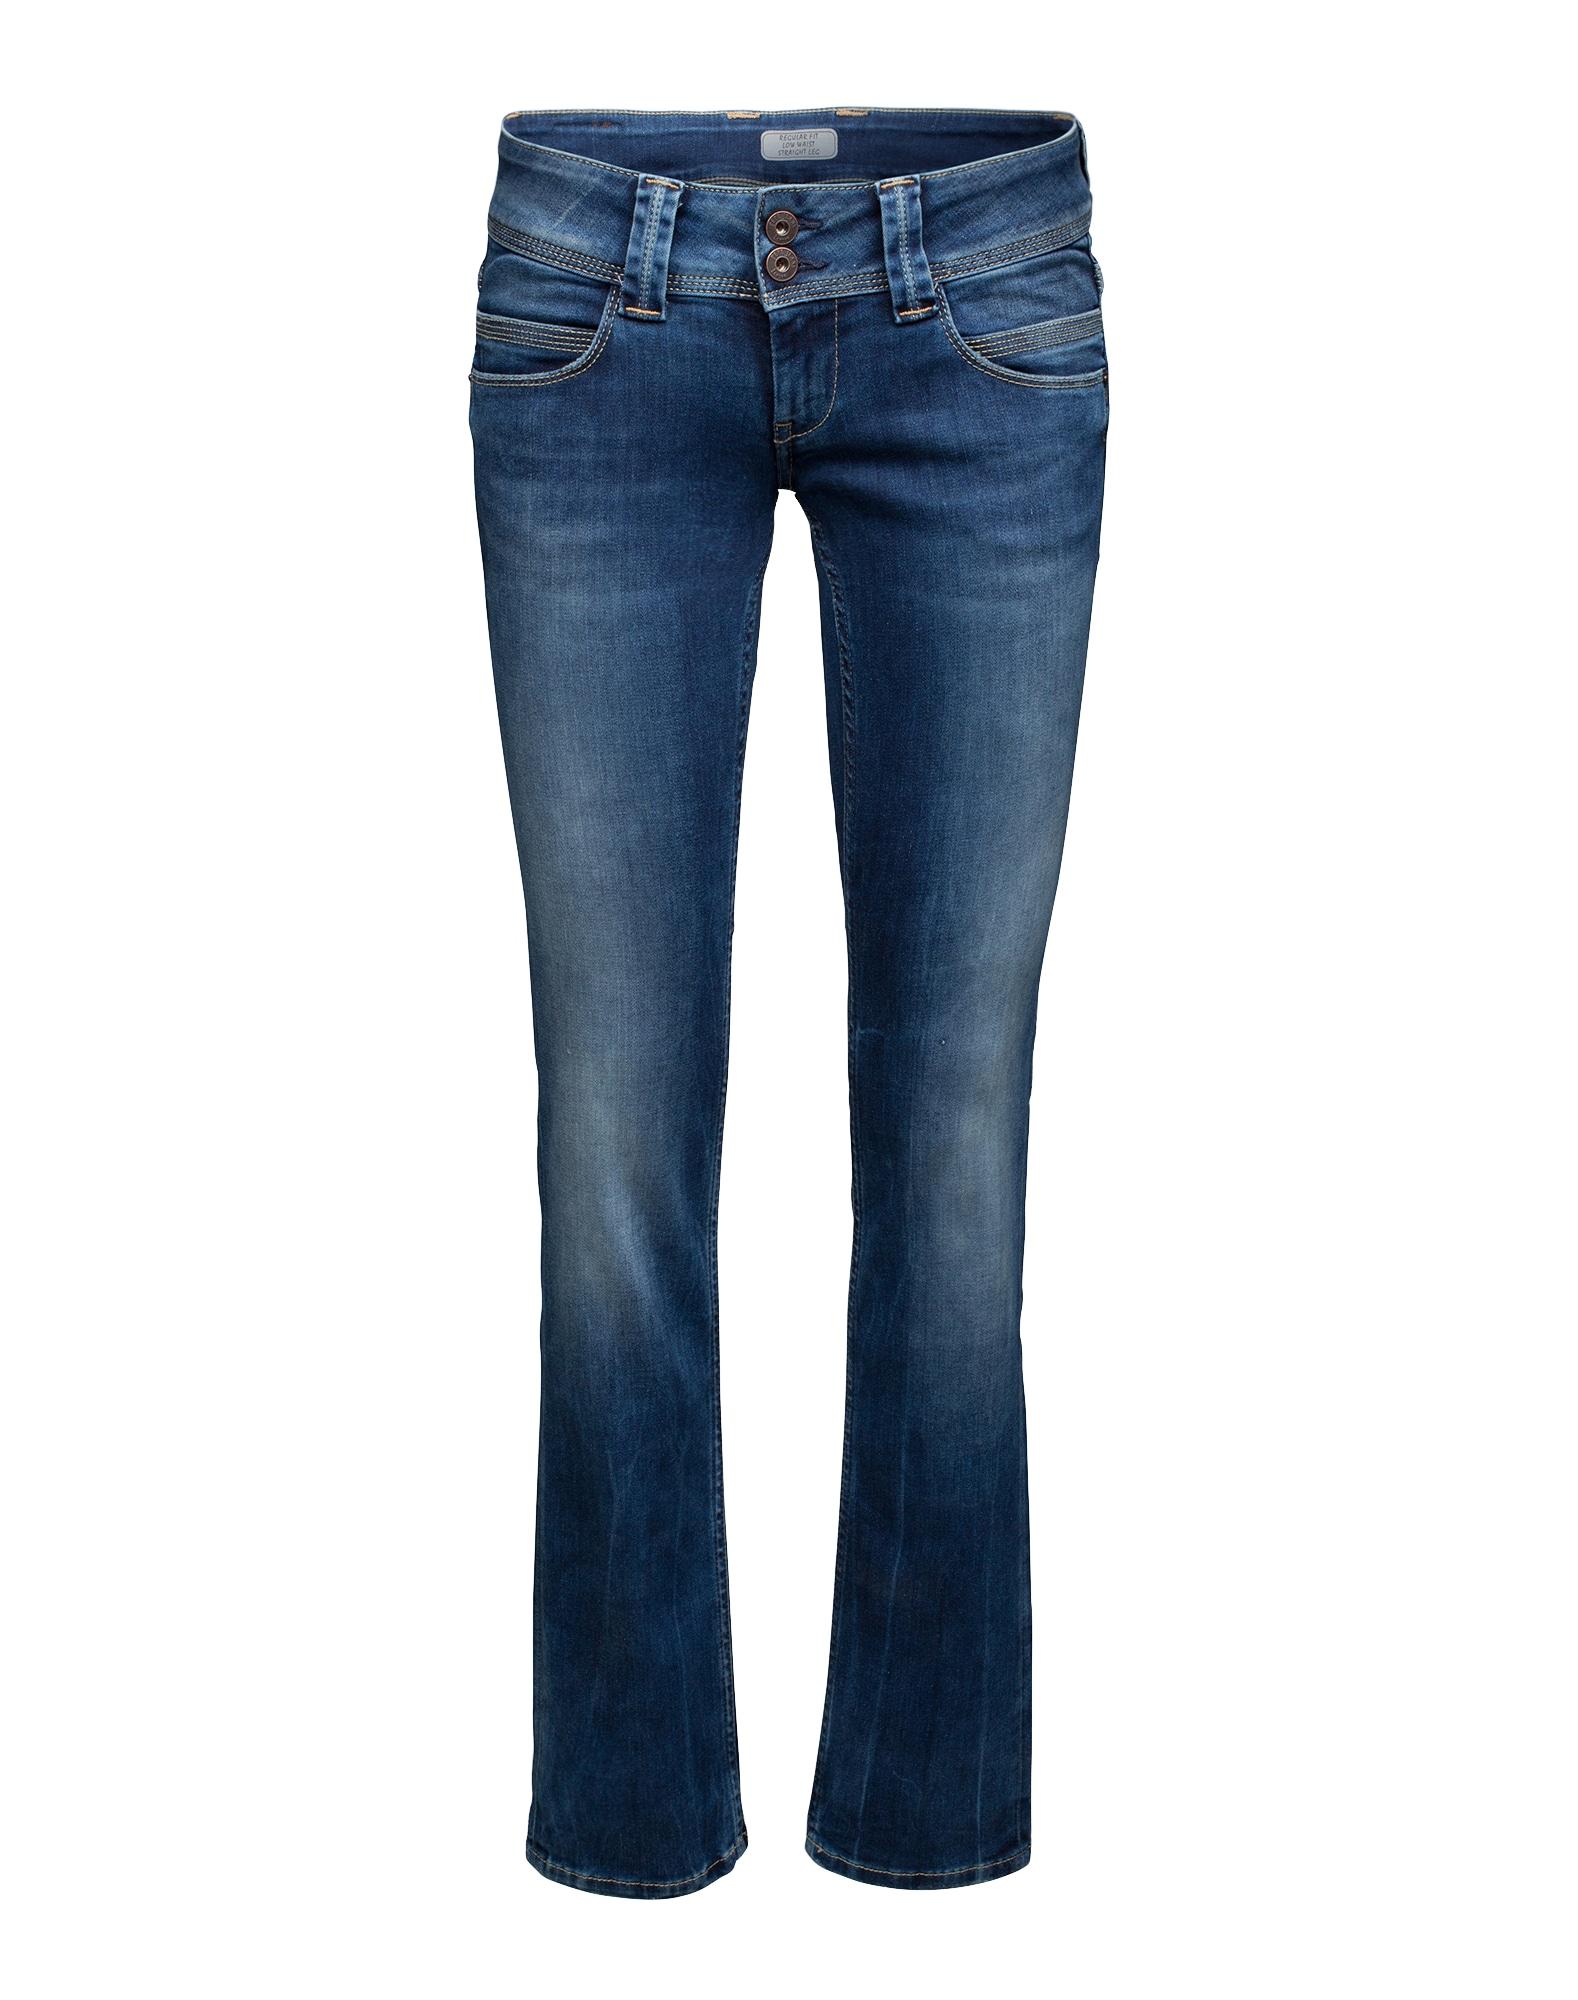 Pepe Jeans Dames Jeans Venus blue denim